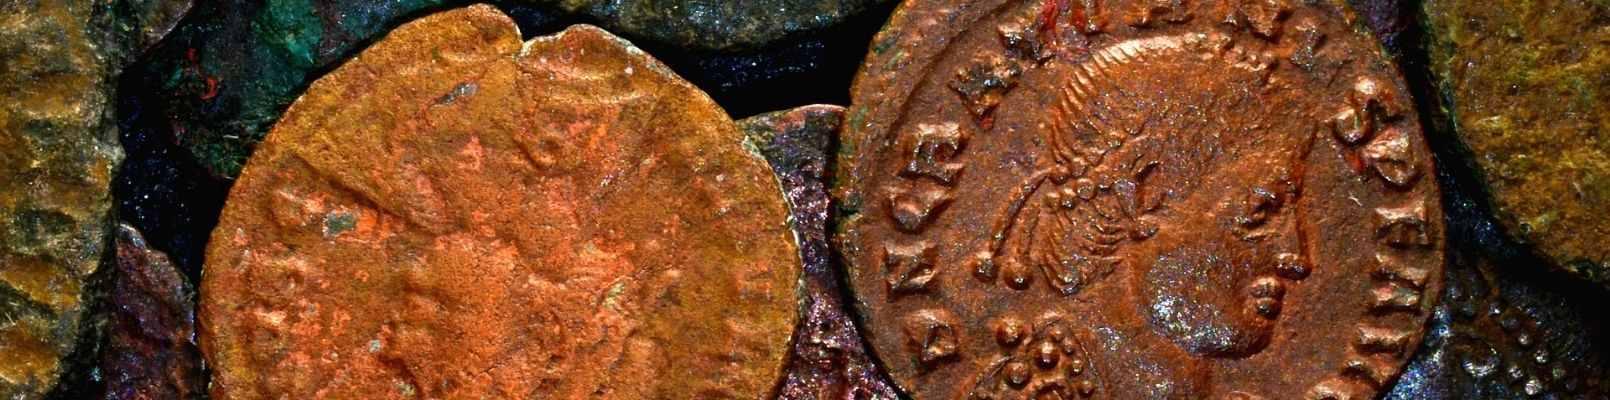 istoria banilor monede vechi